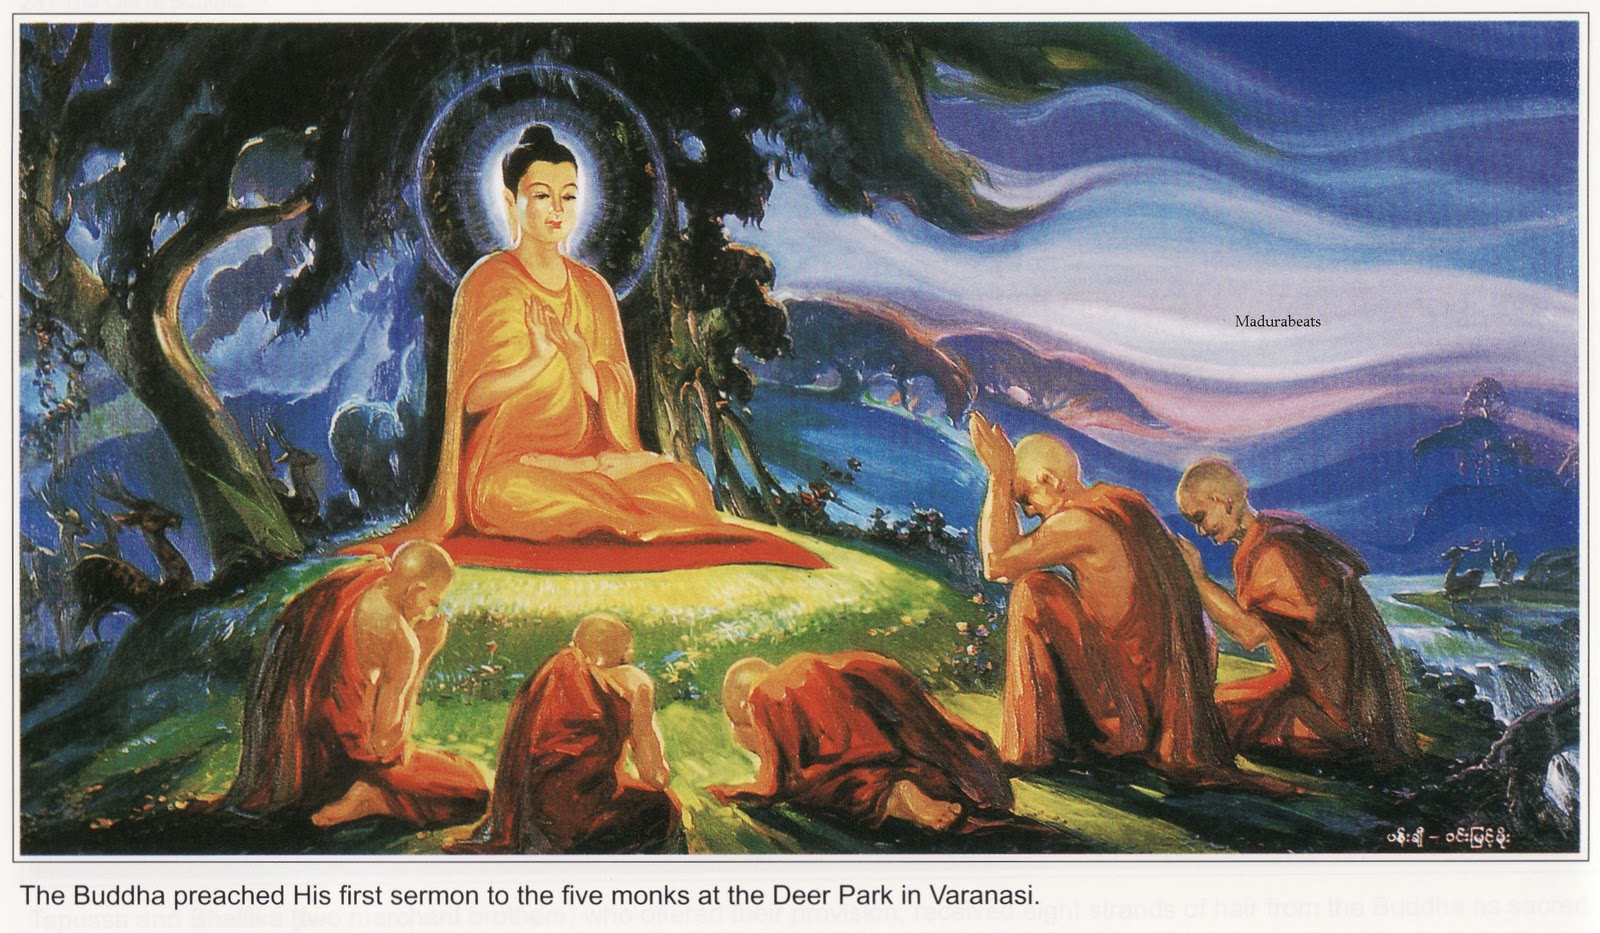 http://2.bp.blogspot.com/_z4BcYVnVAso/TP4mJkBPY_I/AAAAAAAAAsw/yNW4wueDeZc/s1600/Buddha-Saranath-preachings.jpg